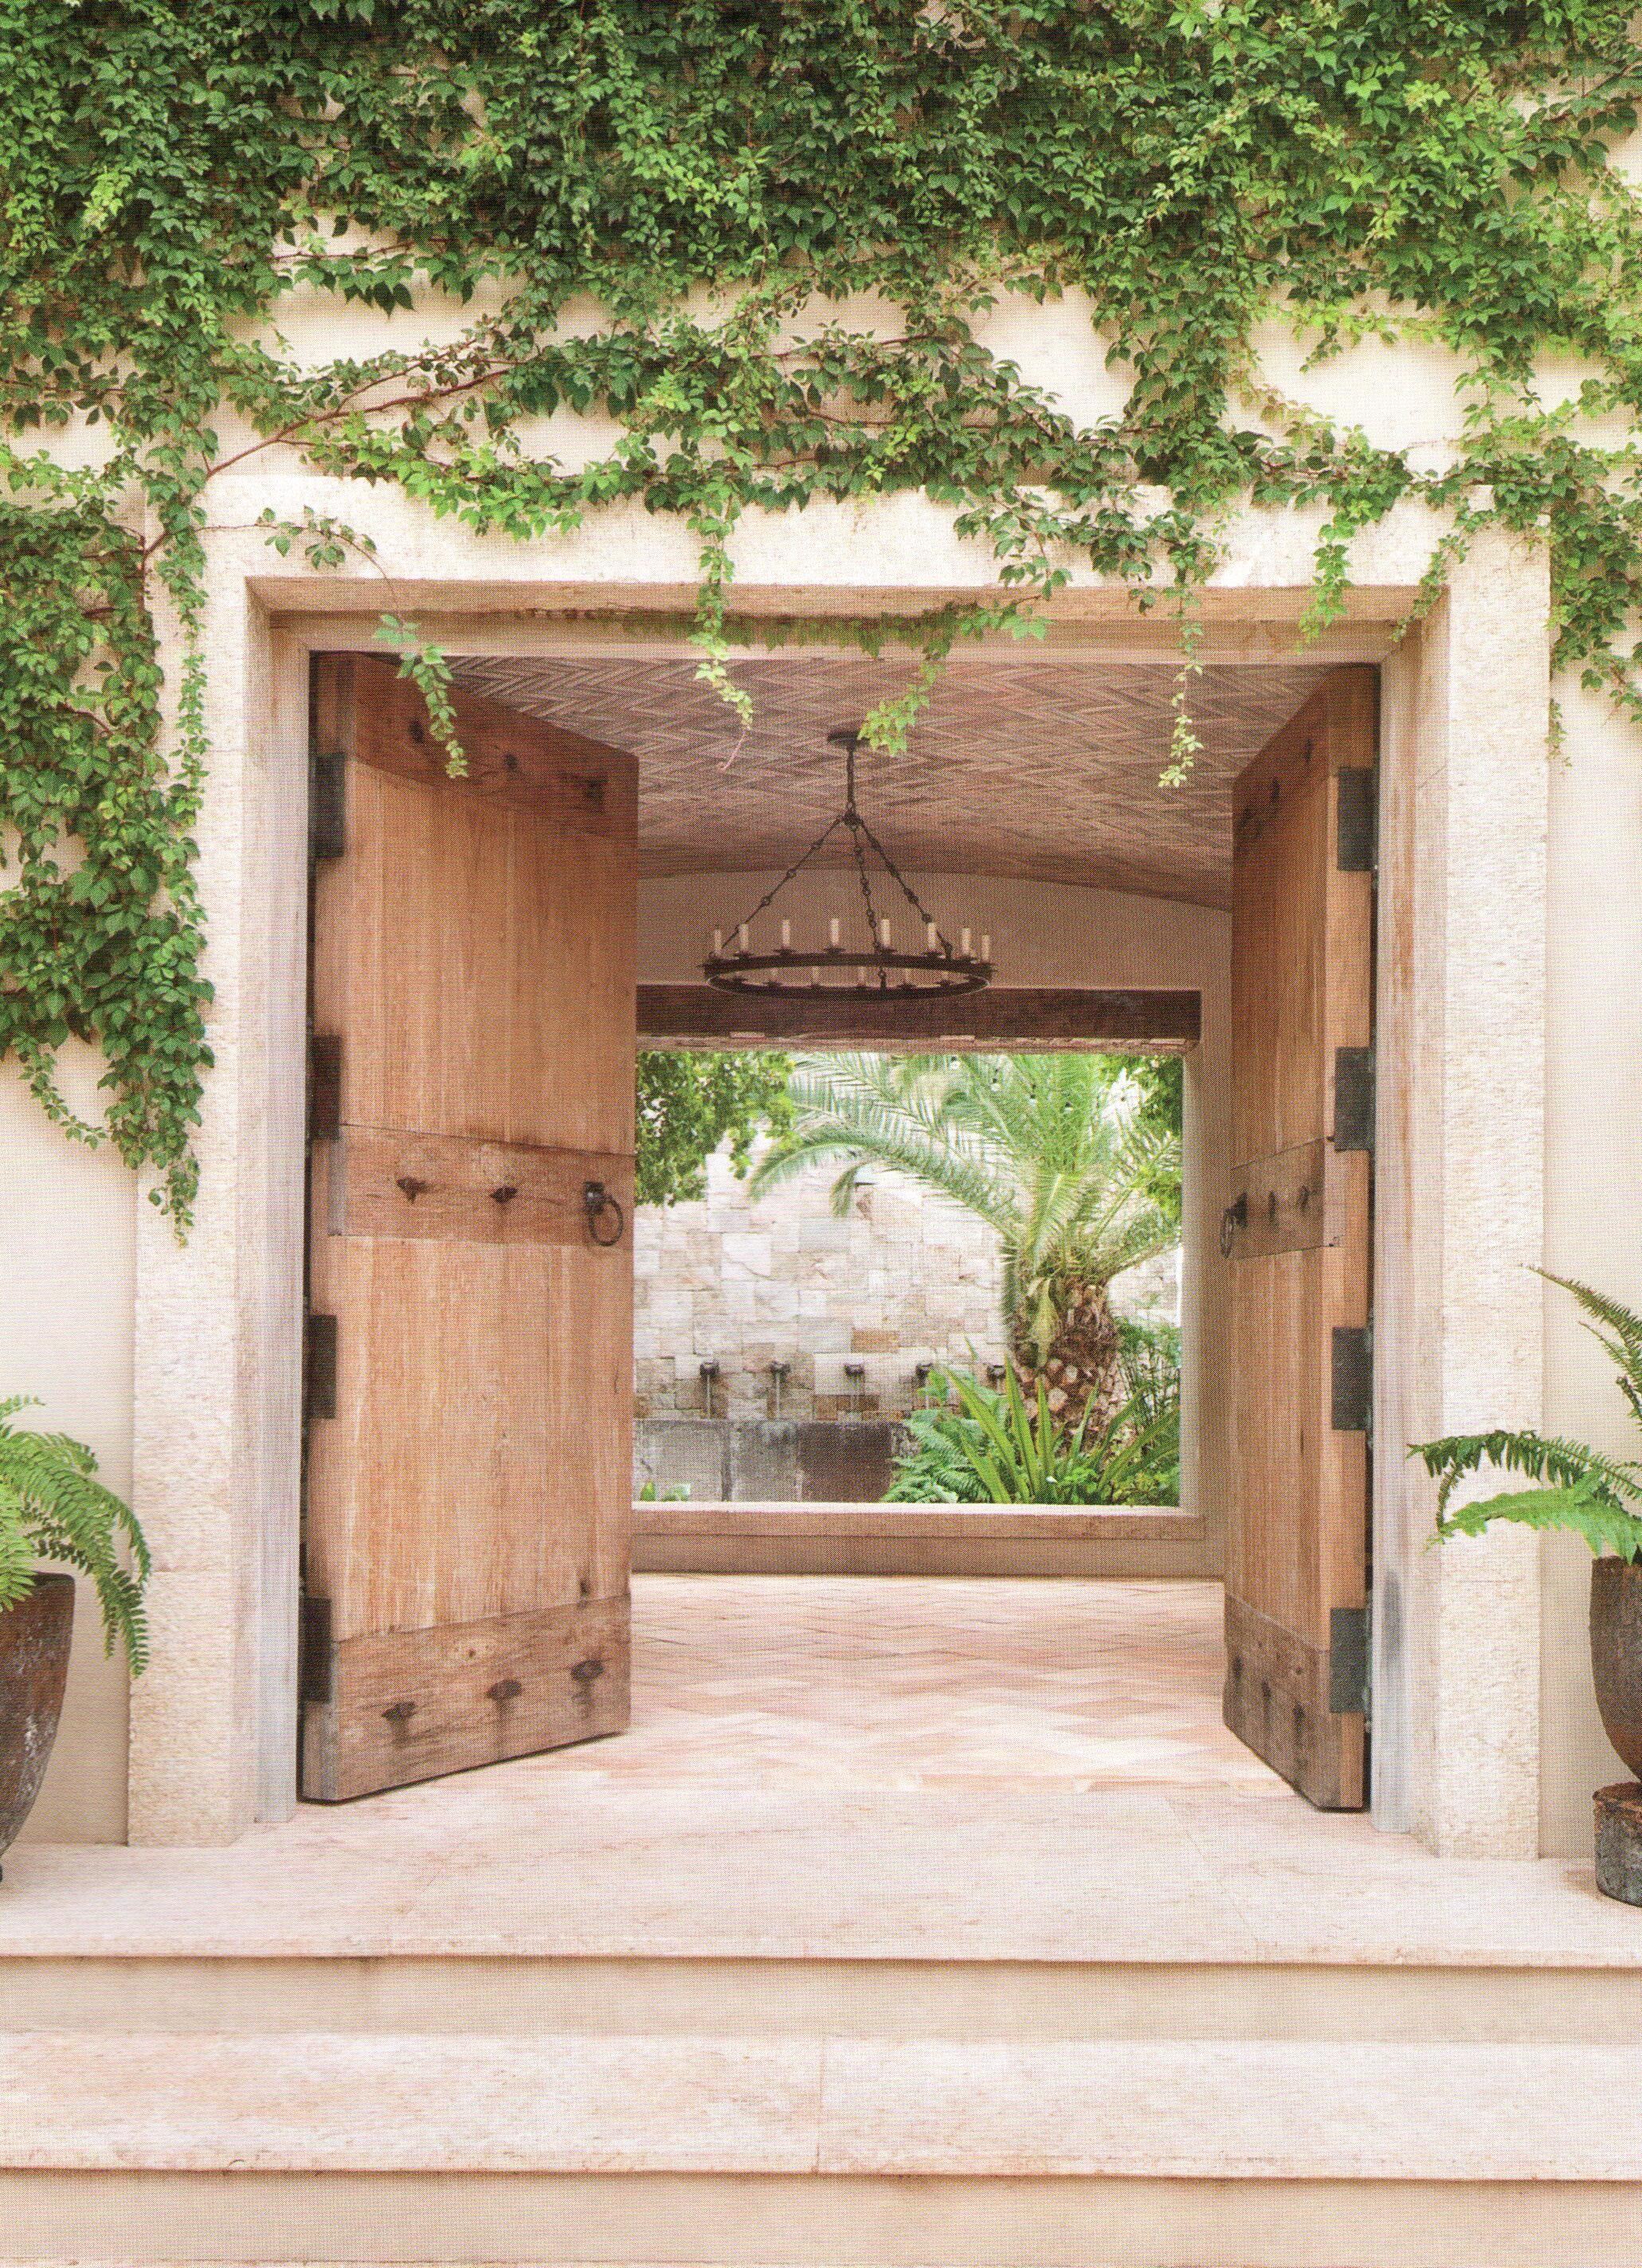 Molduras de marco puerta interior barn doors doors spanish house interior - Molduras para puertas ...